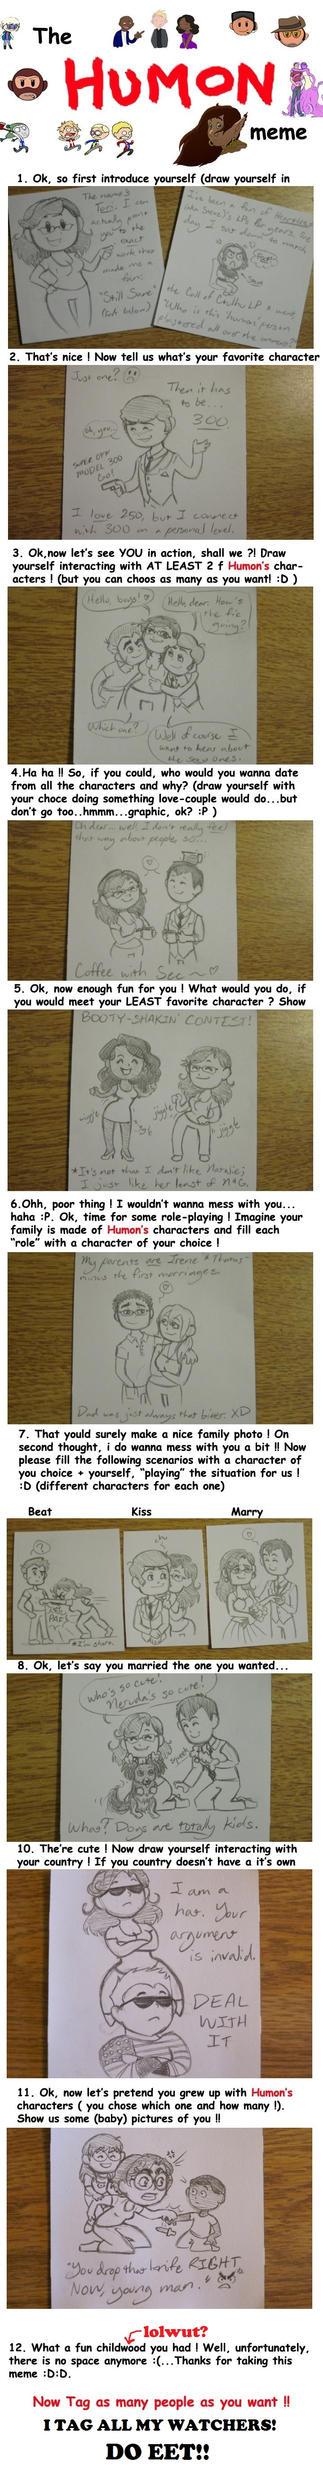 The Humon Meme (Complete!) by Daeranilen